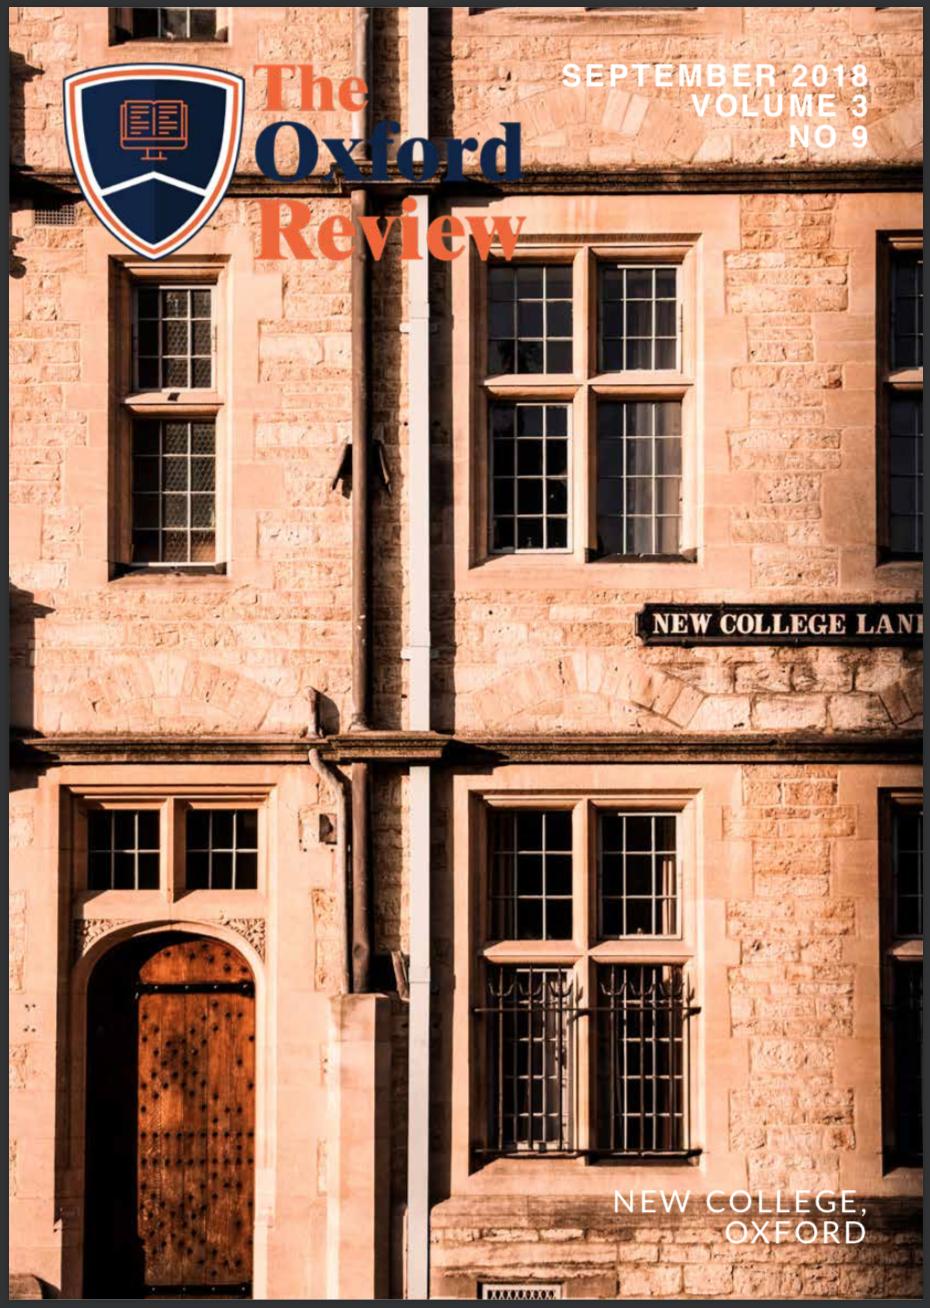 Oxford Review Vol 3 No 9